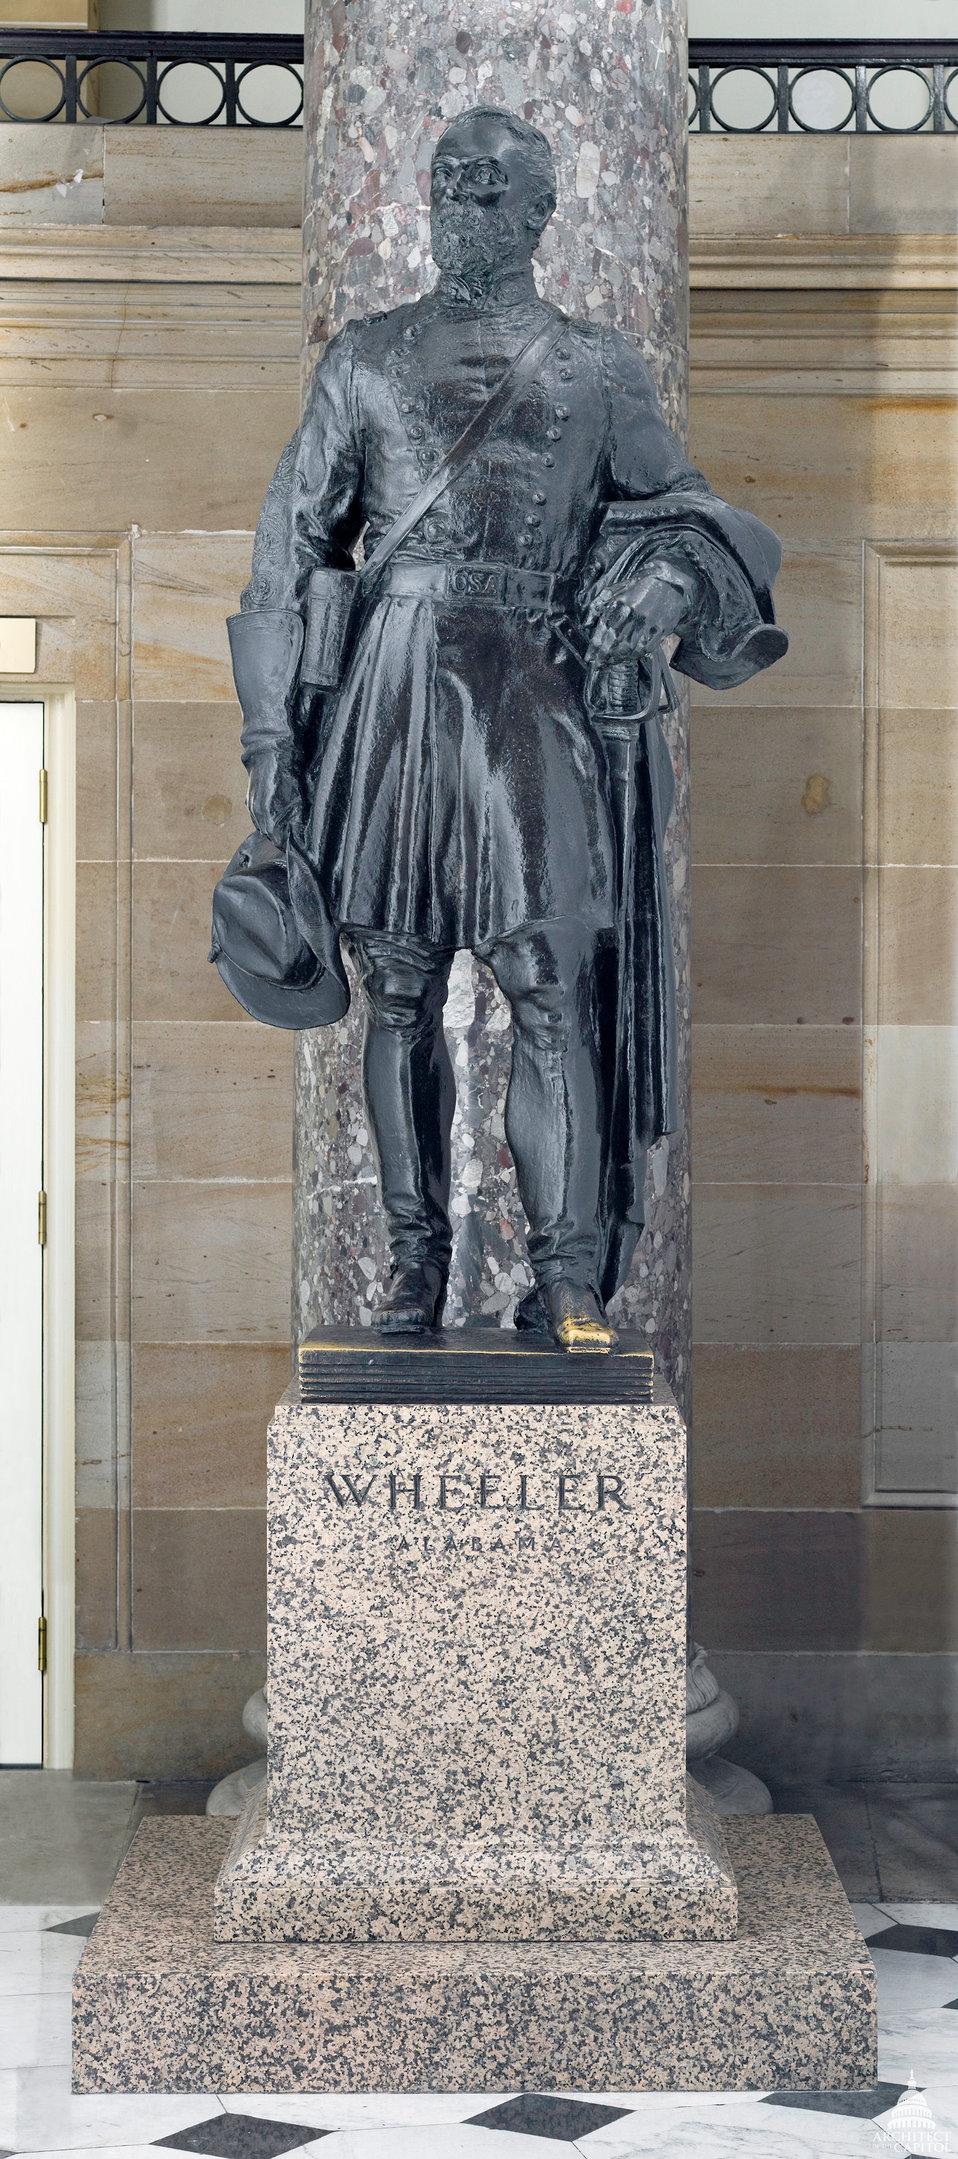 Joseph Wheeler Statue